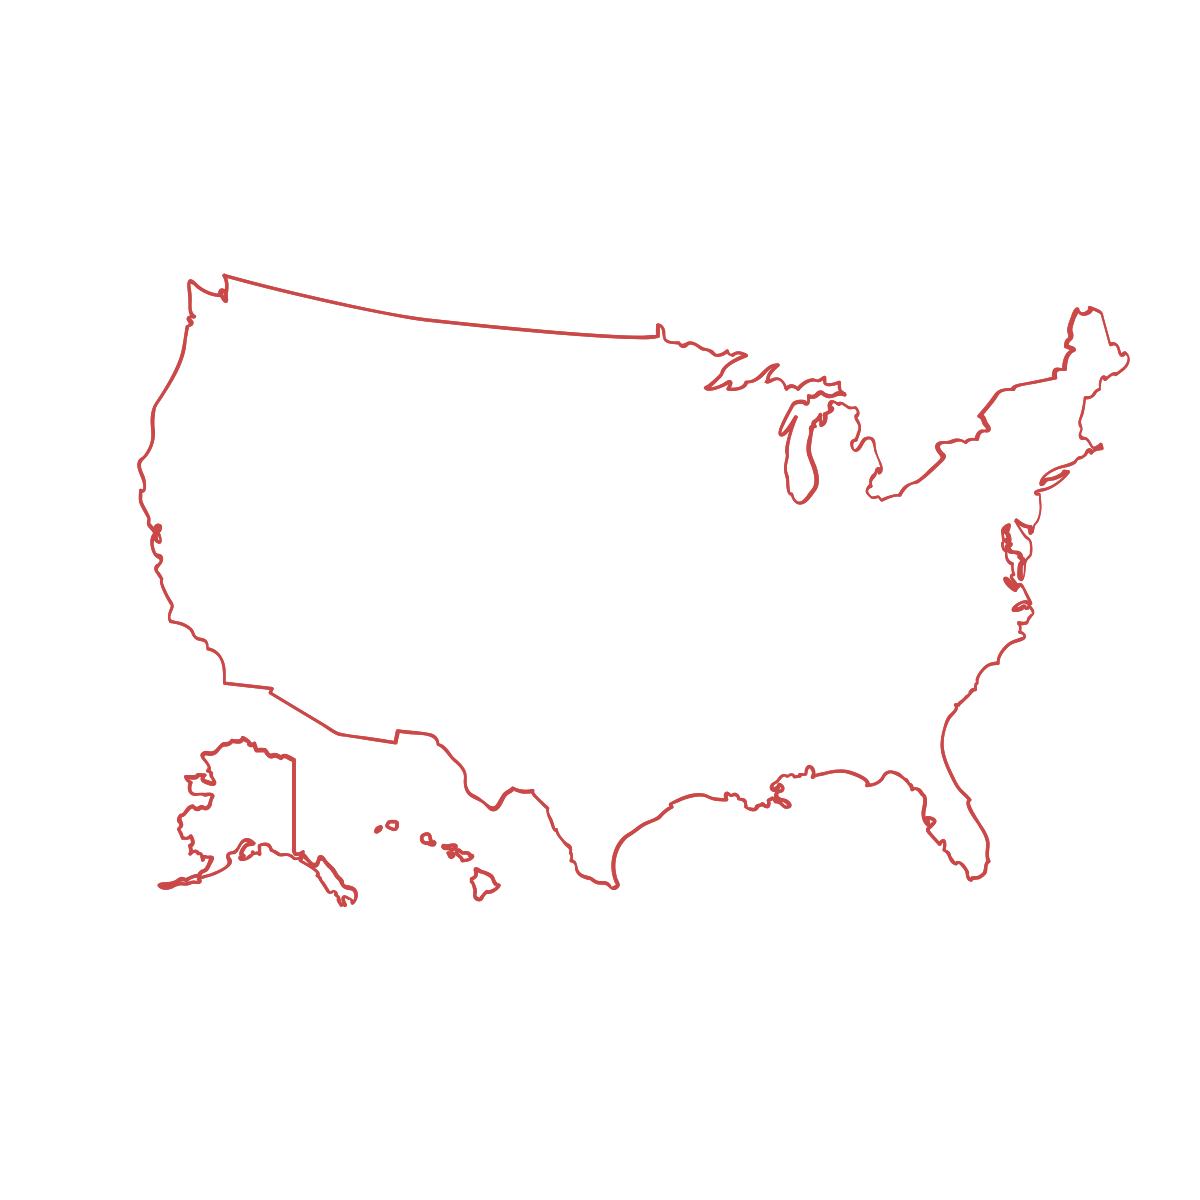 noun_USA Map Ouline_889944_ca4948.png